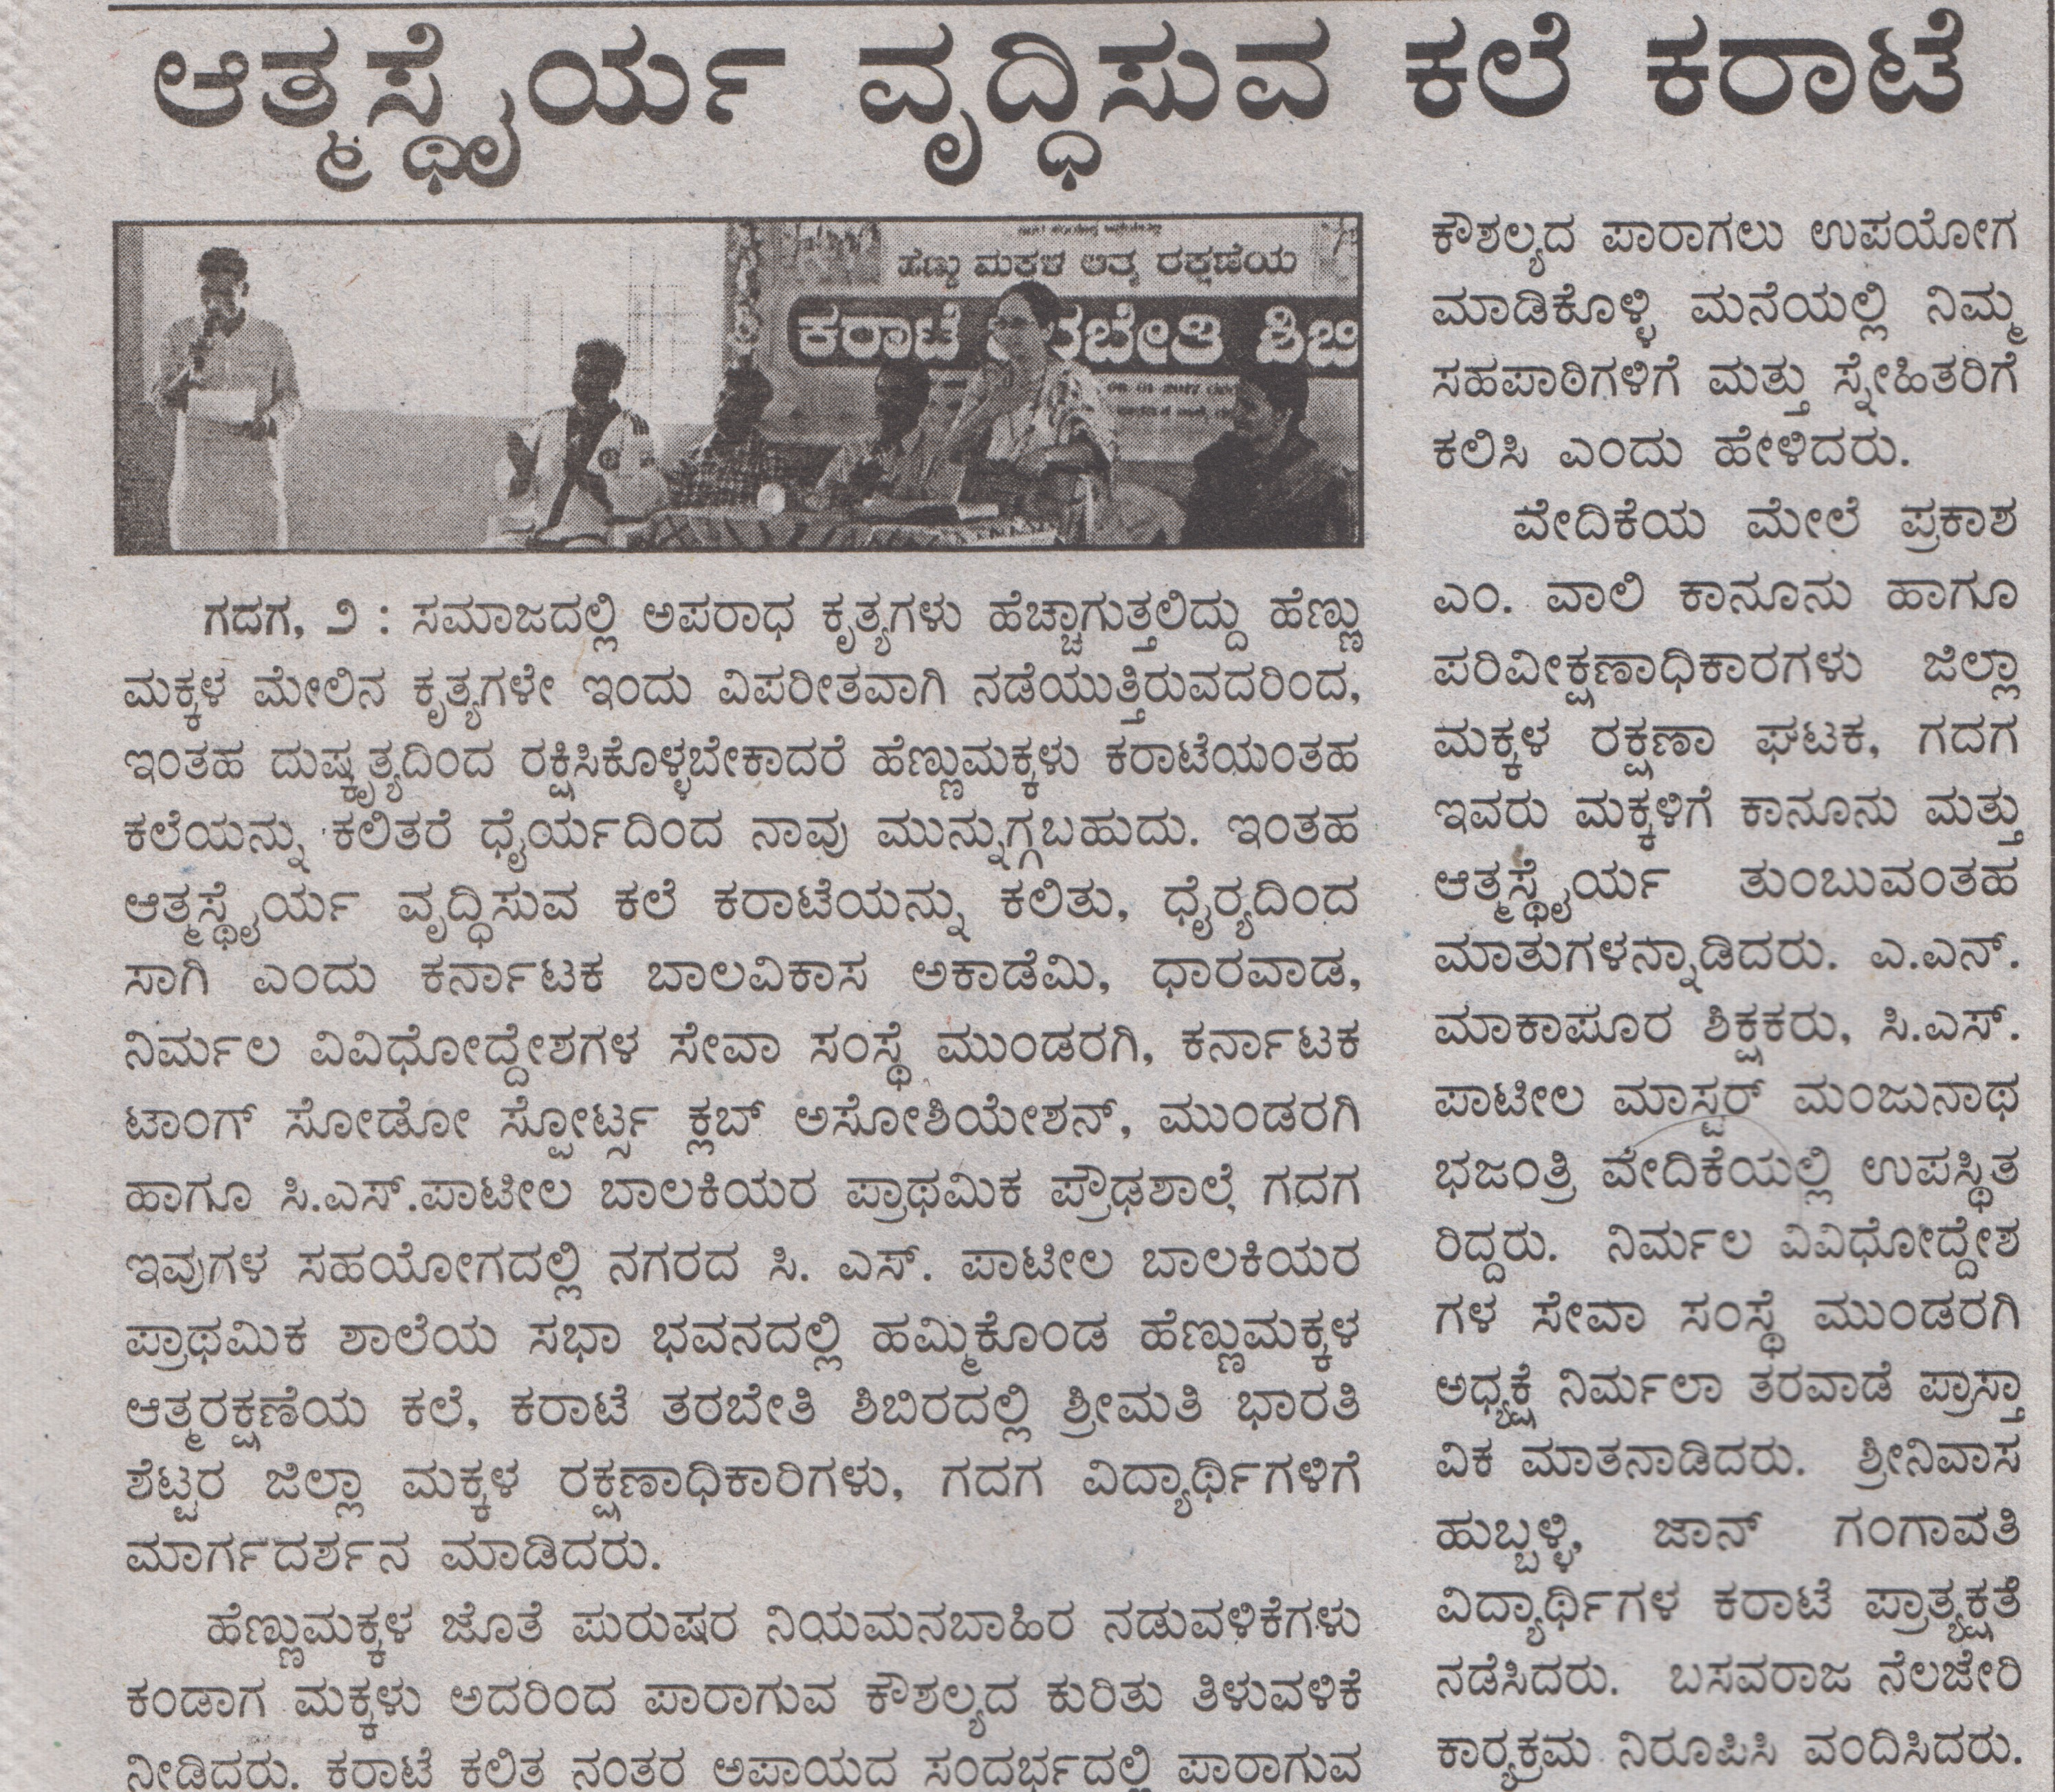 /media/nirmalavss/1NGO-00290-Nirmala_Vivedodeshagala_Seva_Samsthe-Paper_Media_Coverage-3.jpg